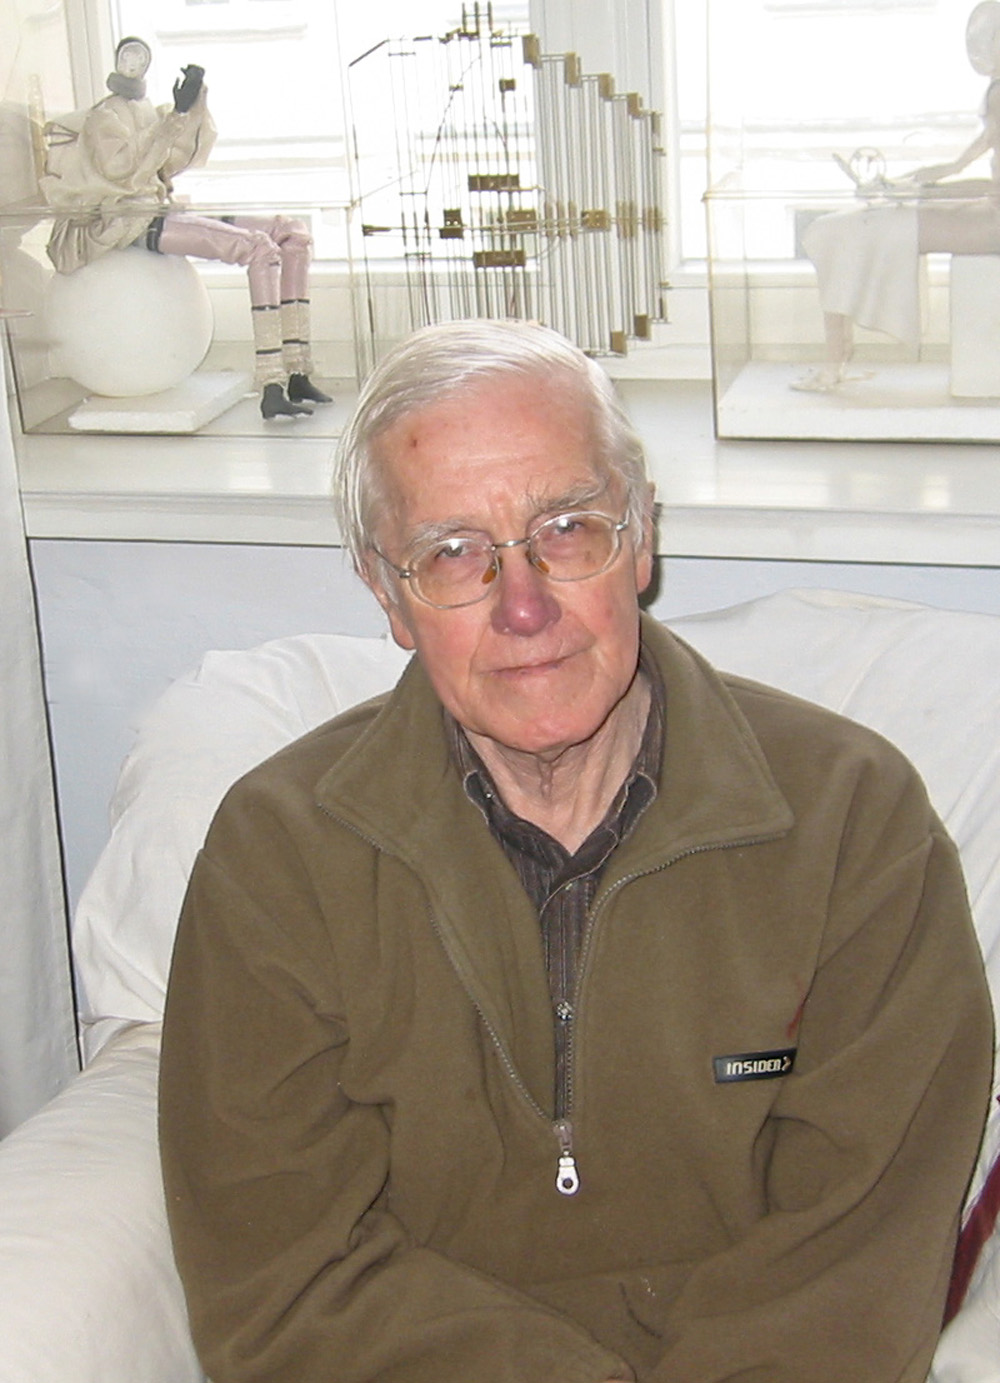 Piotr Kamler